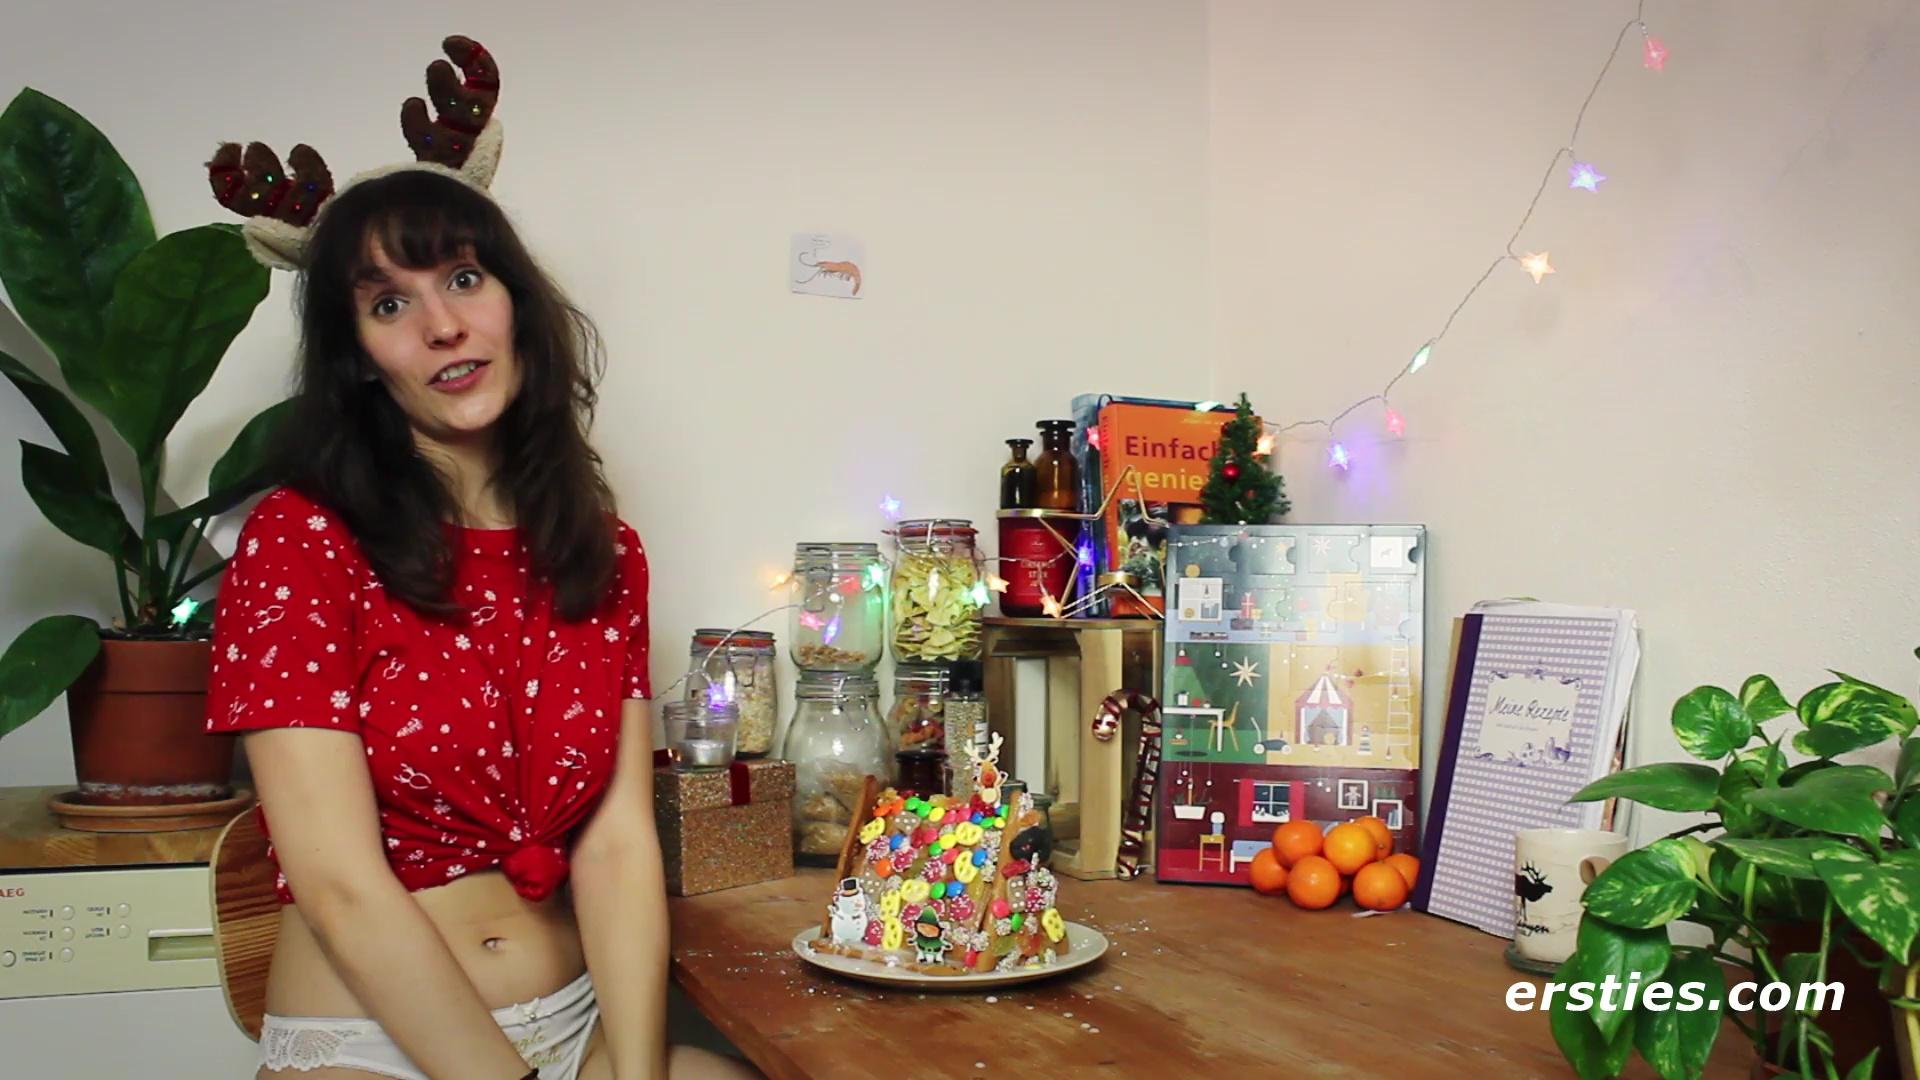 Ersties Sexy Xmas Calendar #20 Olivia S.